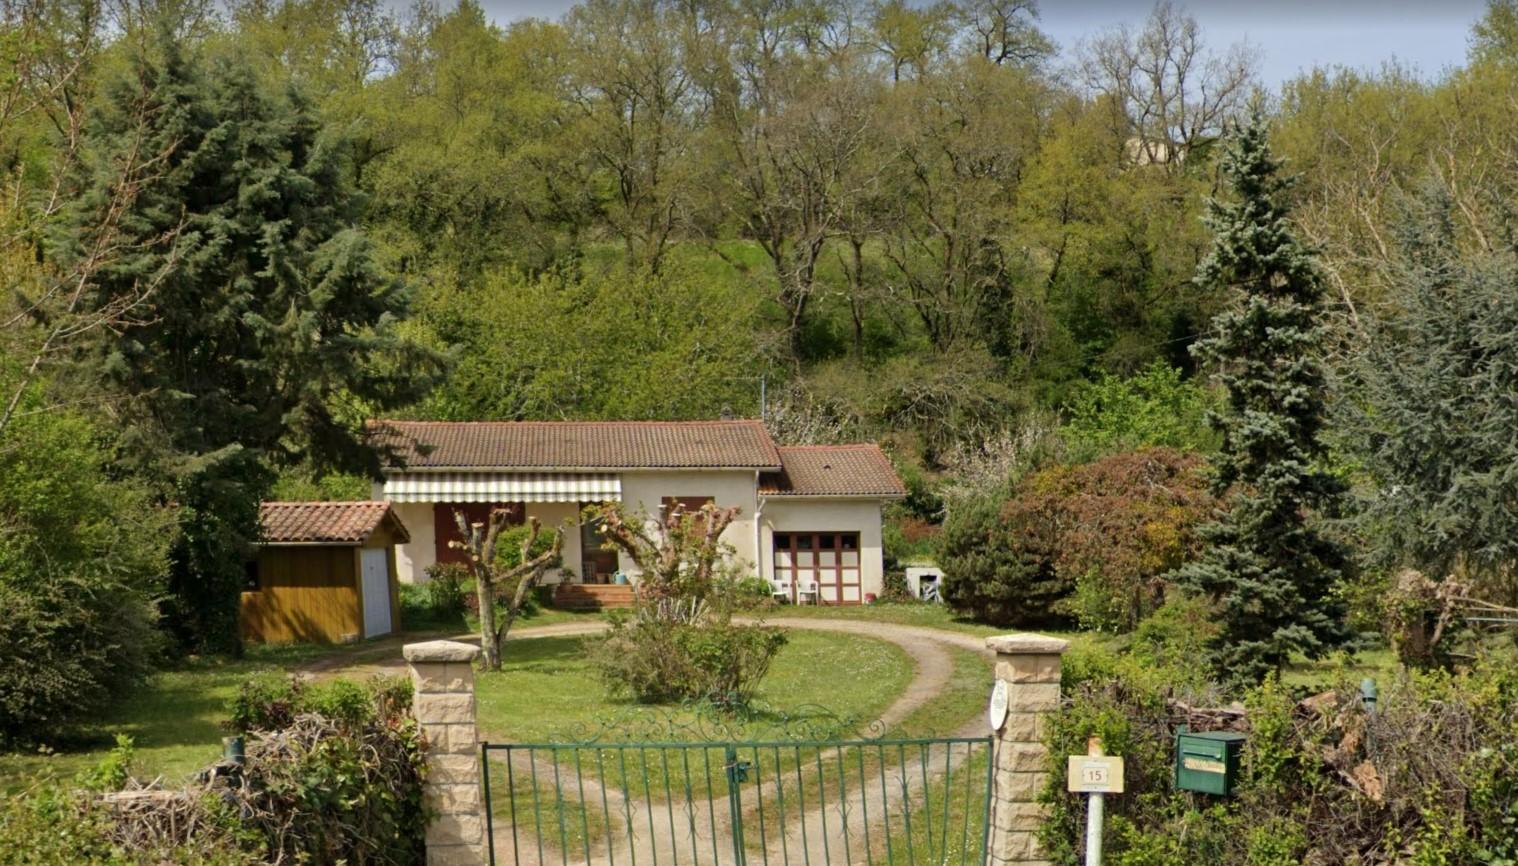 Bungalow for sale France